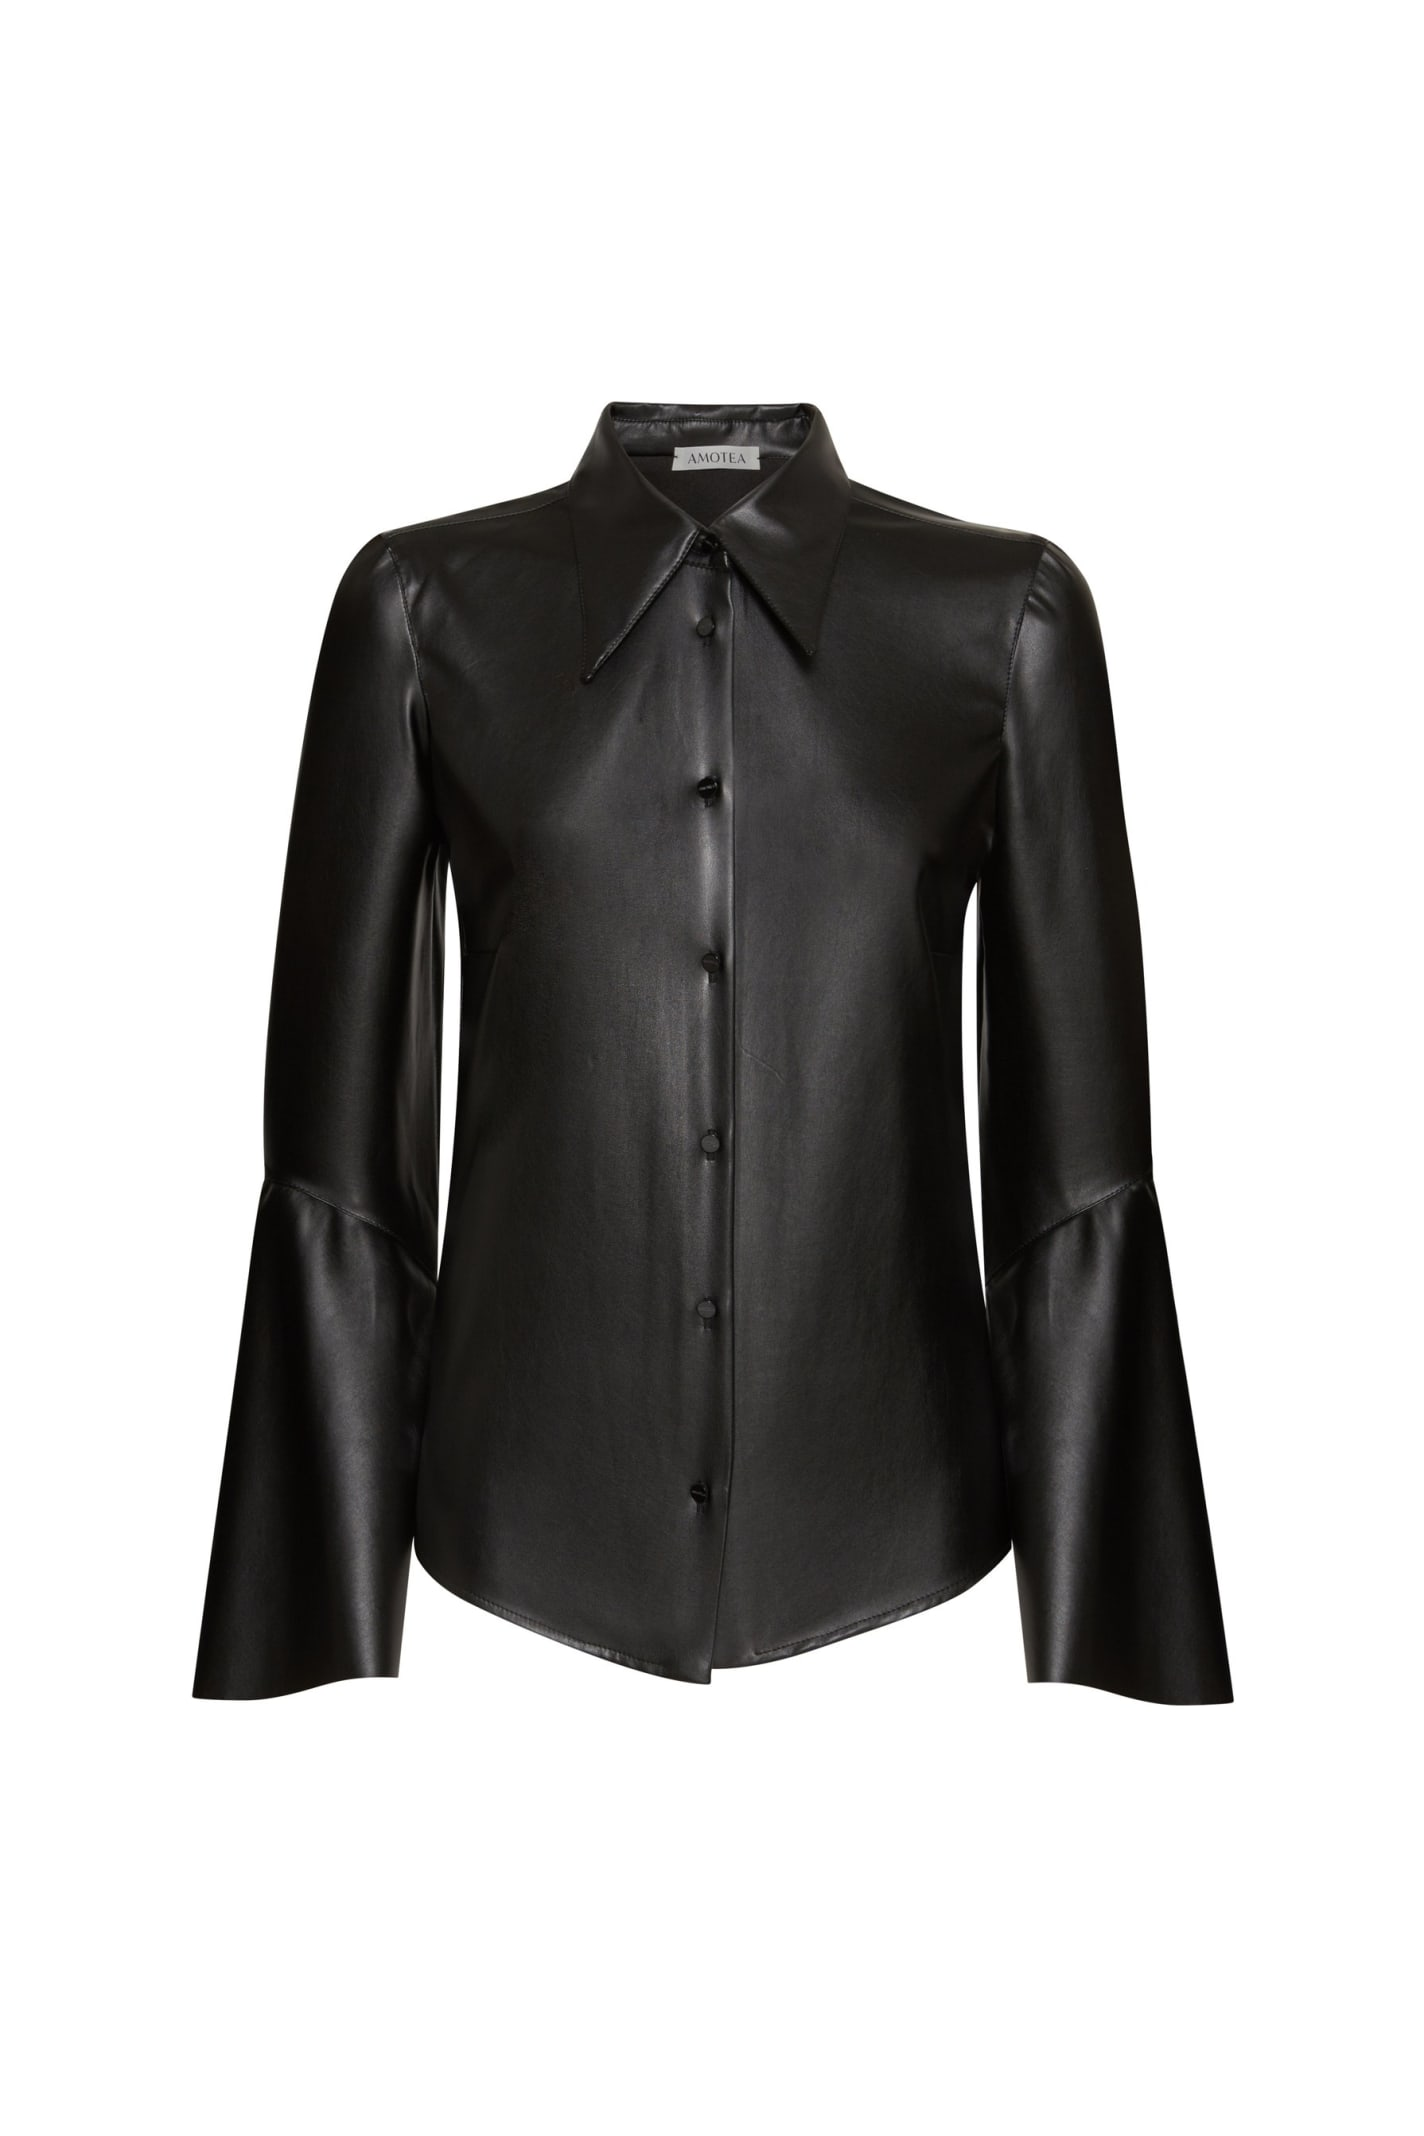 Berna Shirt In Black Eco Leather